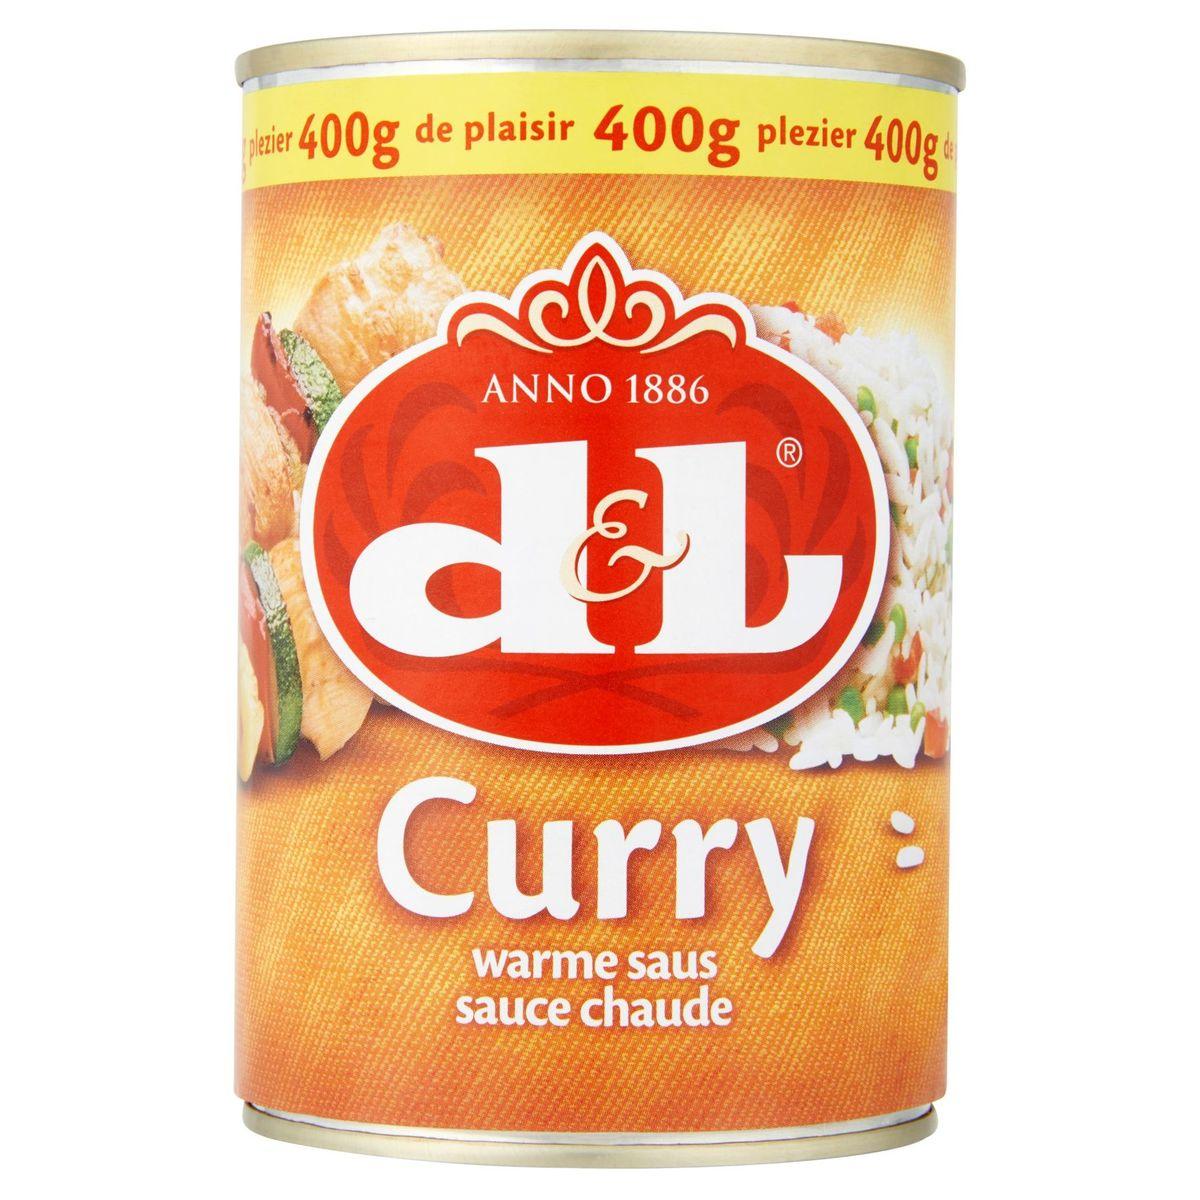 Devos Lemmens Curry Sauce Chaude 400 g